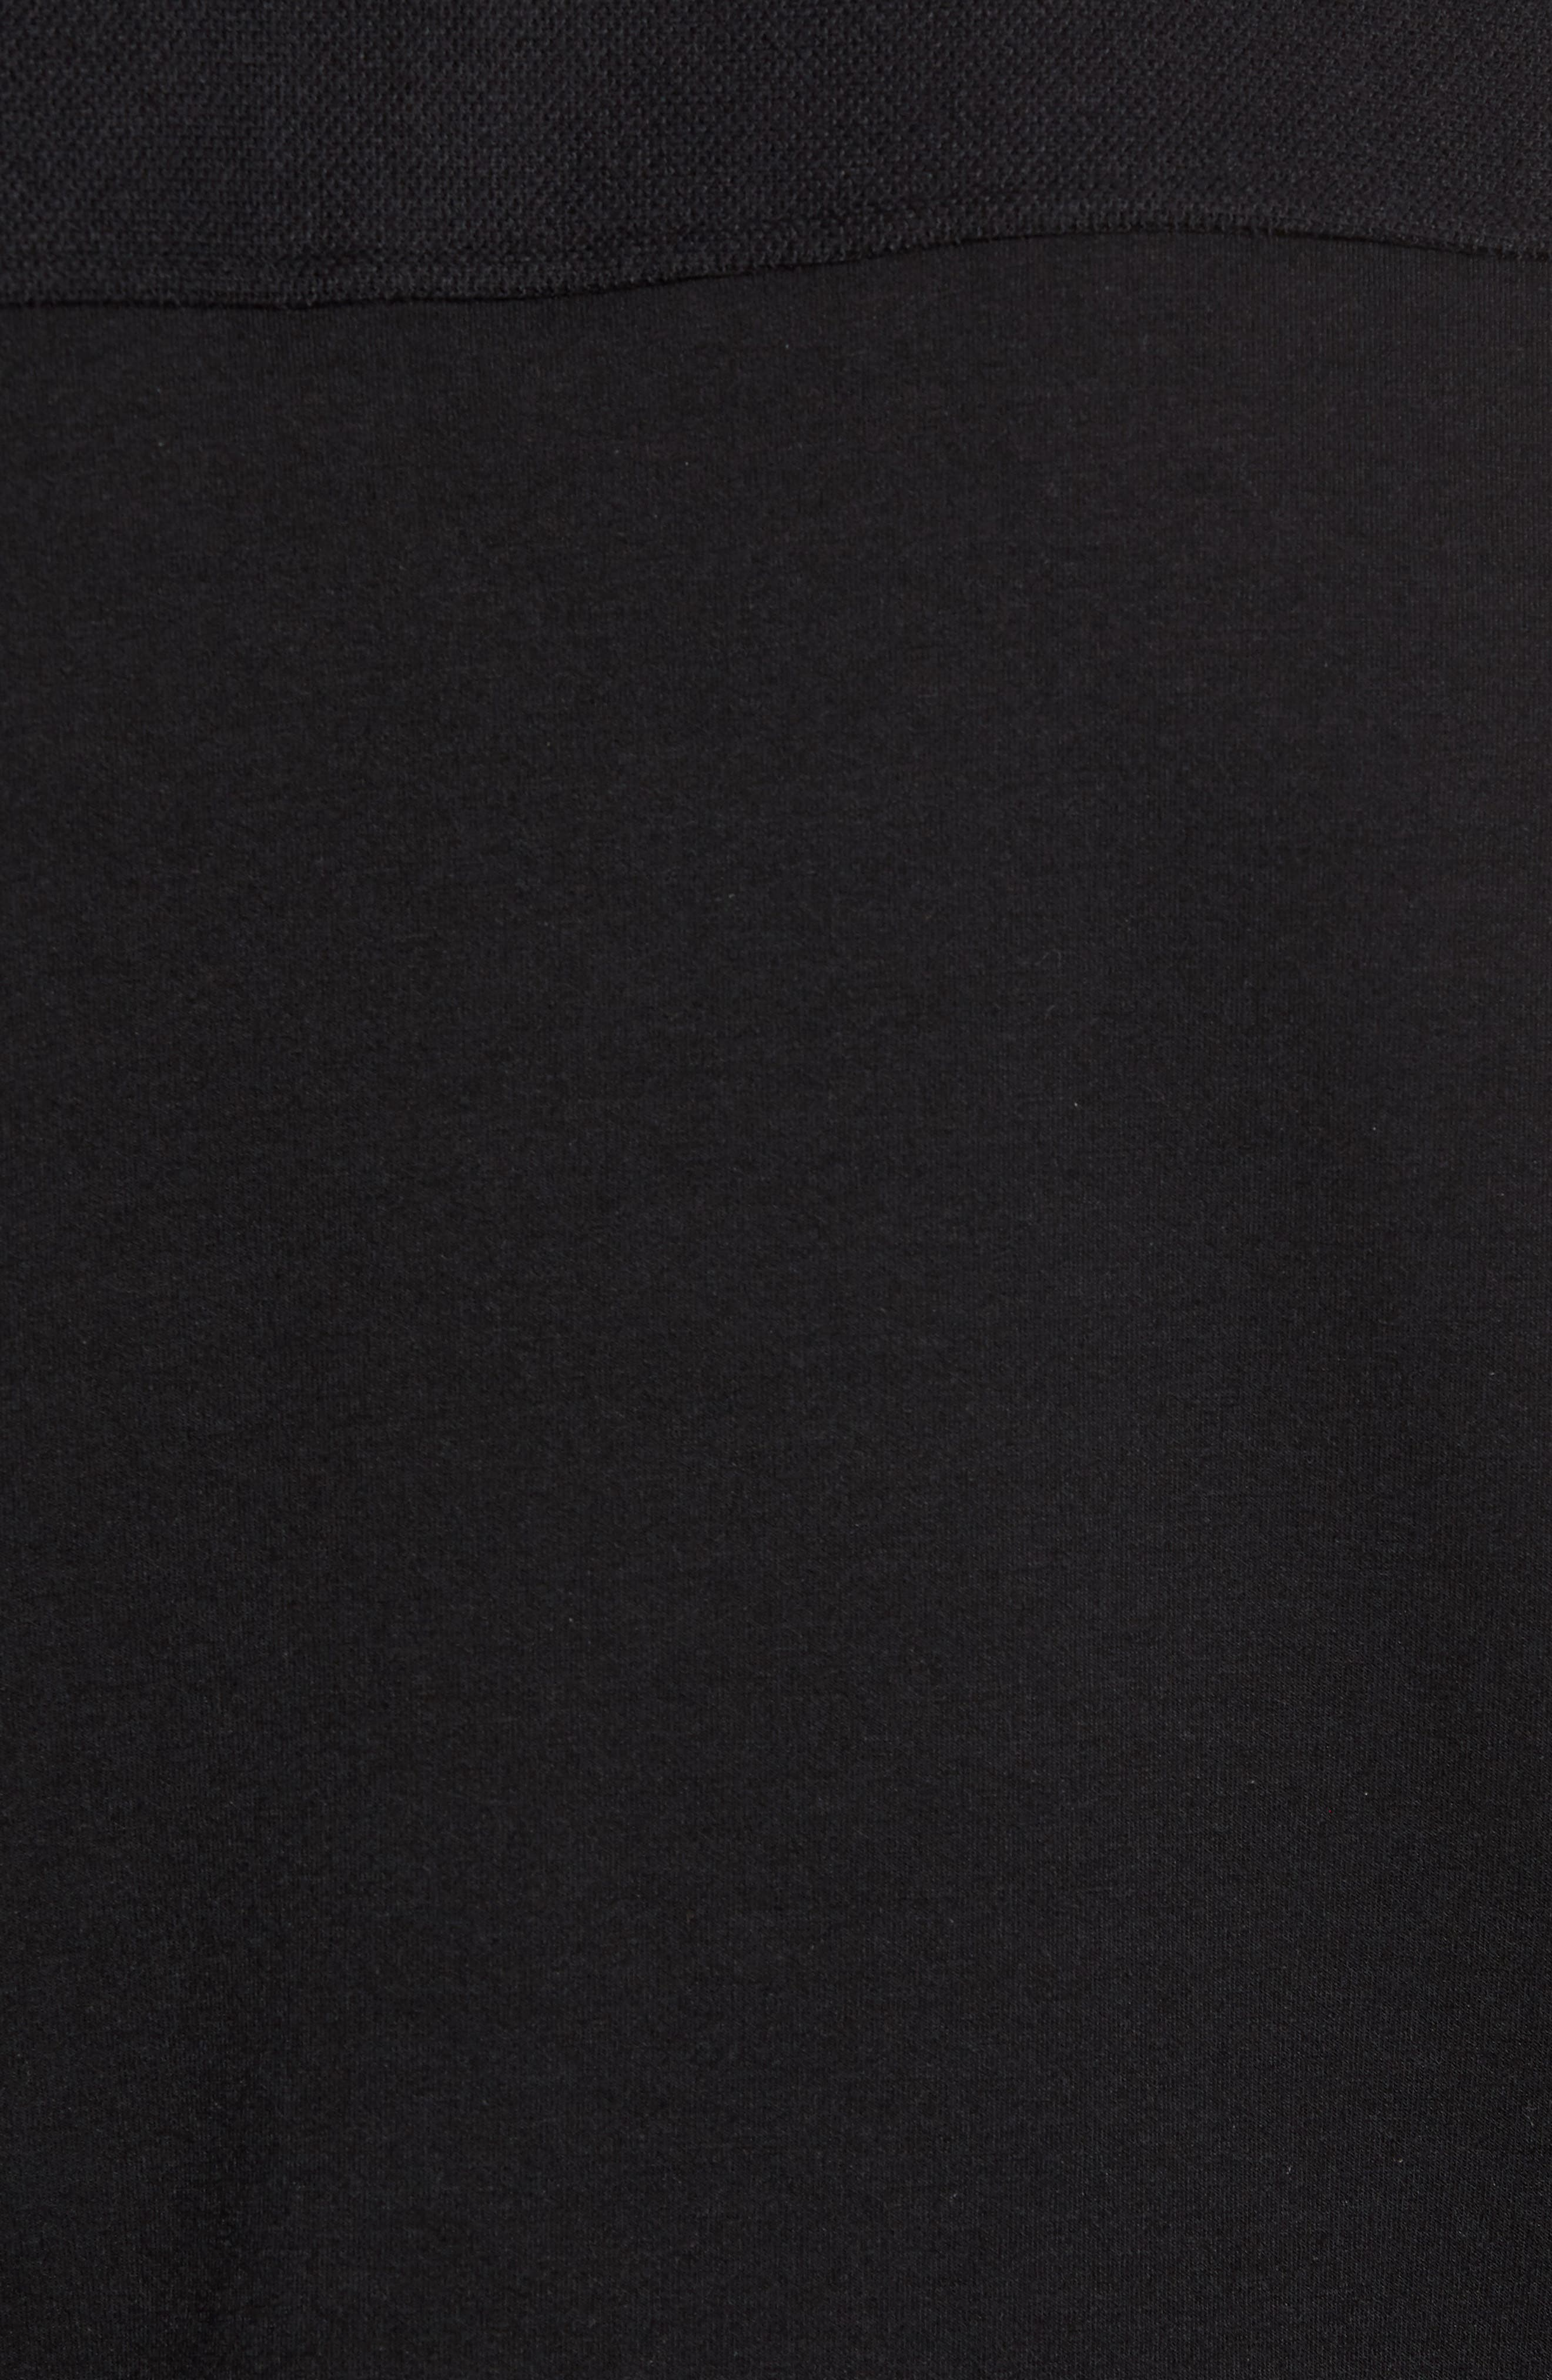 Livstay Slim Fit Quarter Zip Pullover,                             Alternate thumbnail 5, color,                             001